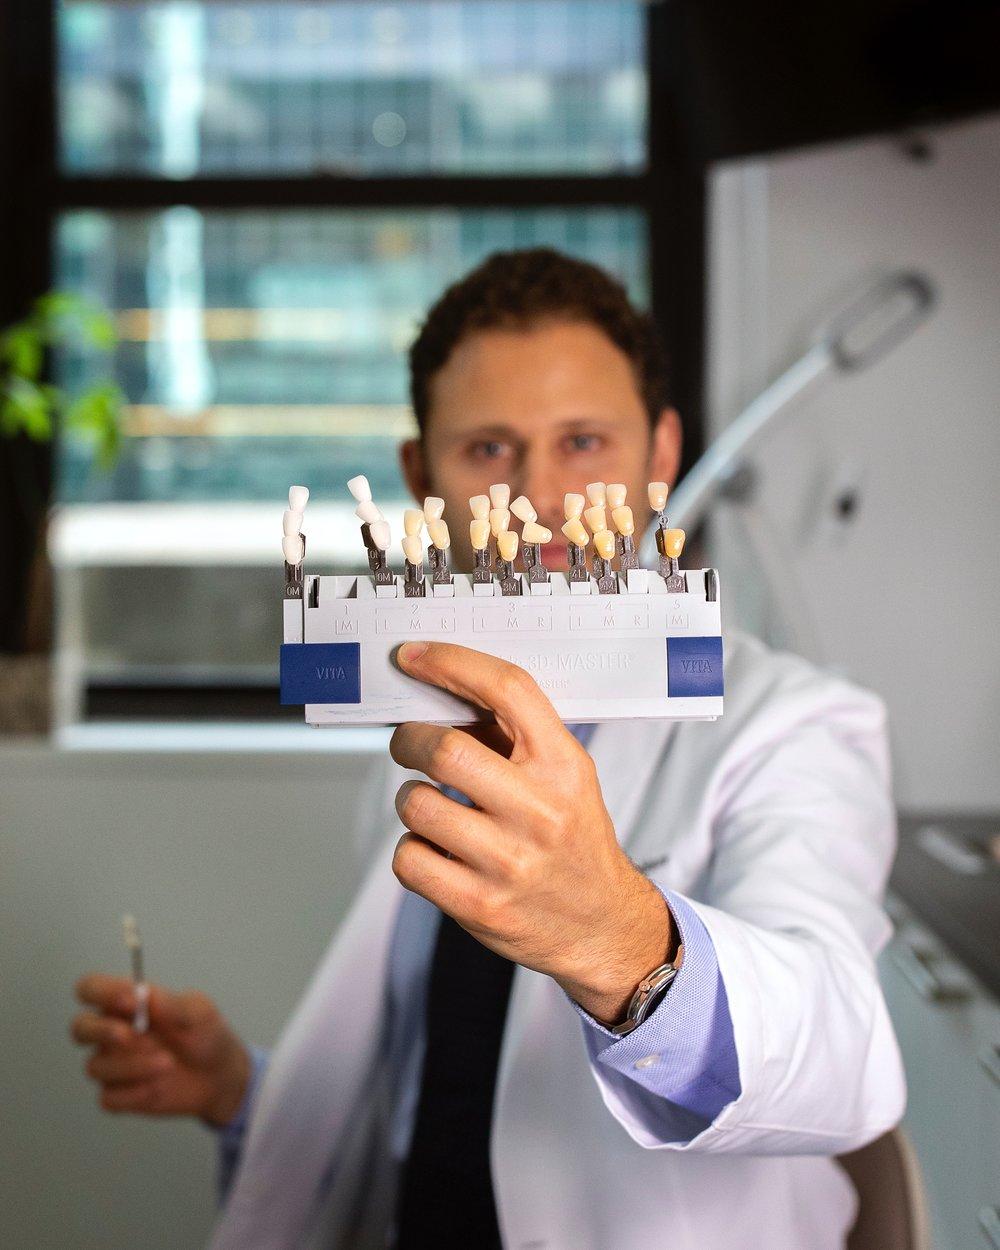 Dr. Alex Rubinov 01 - Jimmy Larkin